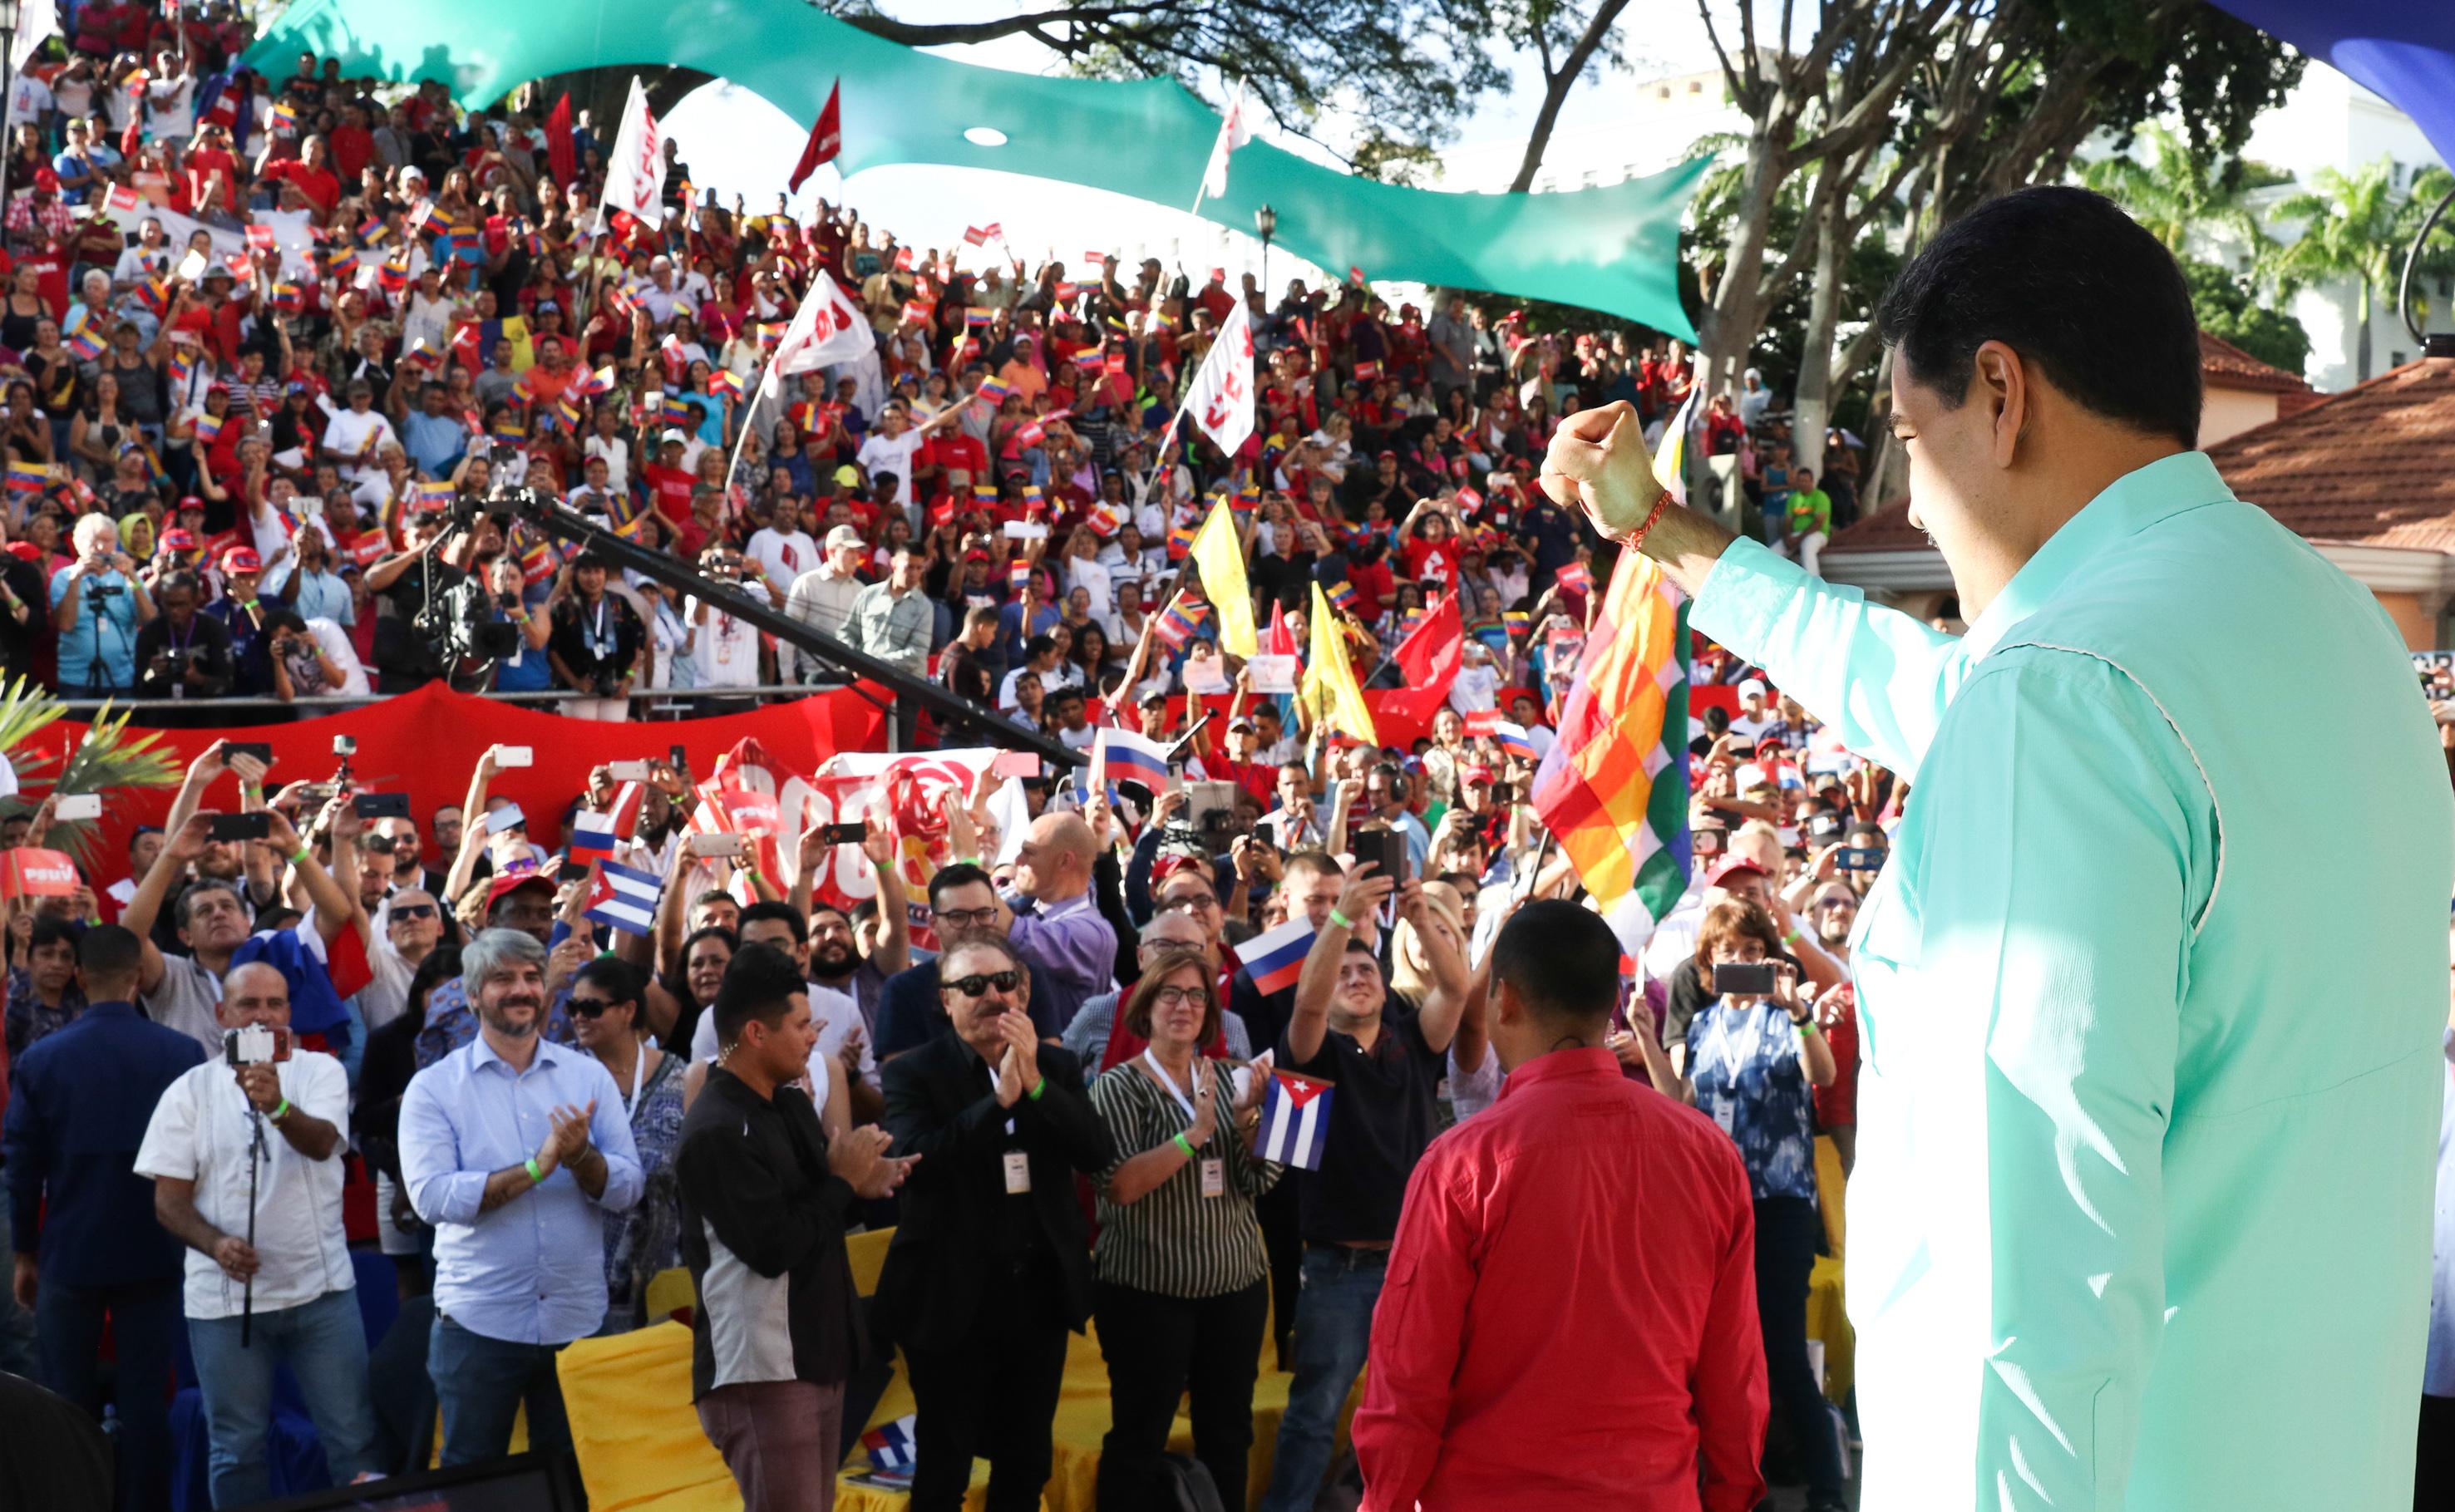 Presidente Maduro exhorta a pueblos del mundo a expresar en redes sociales descontento por silencio de Bachelet